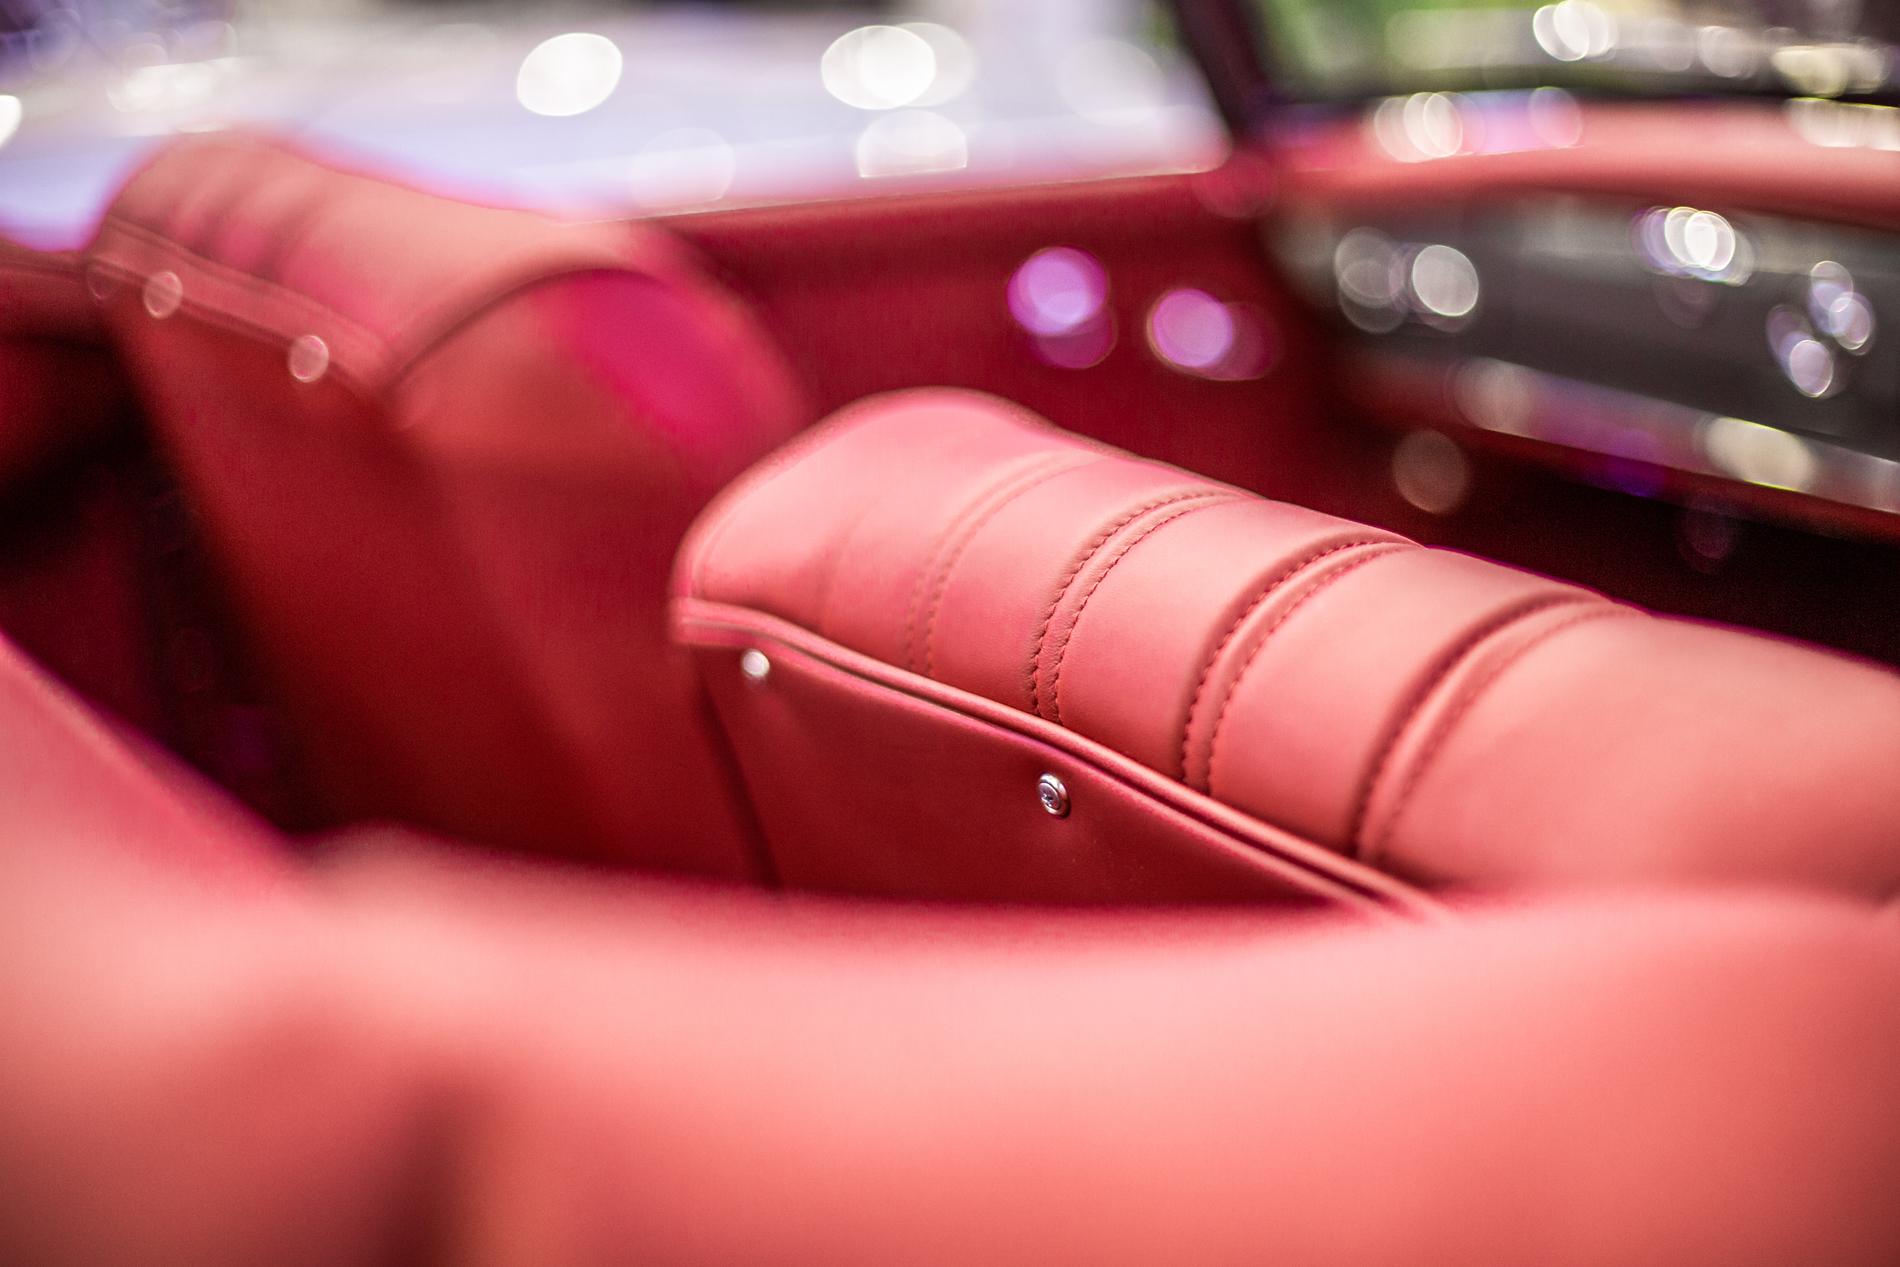 Hemmels W121 190SL in the Showroom